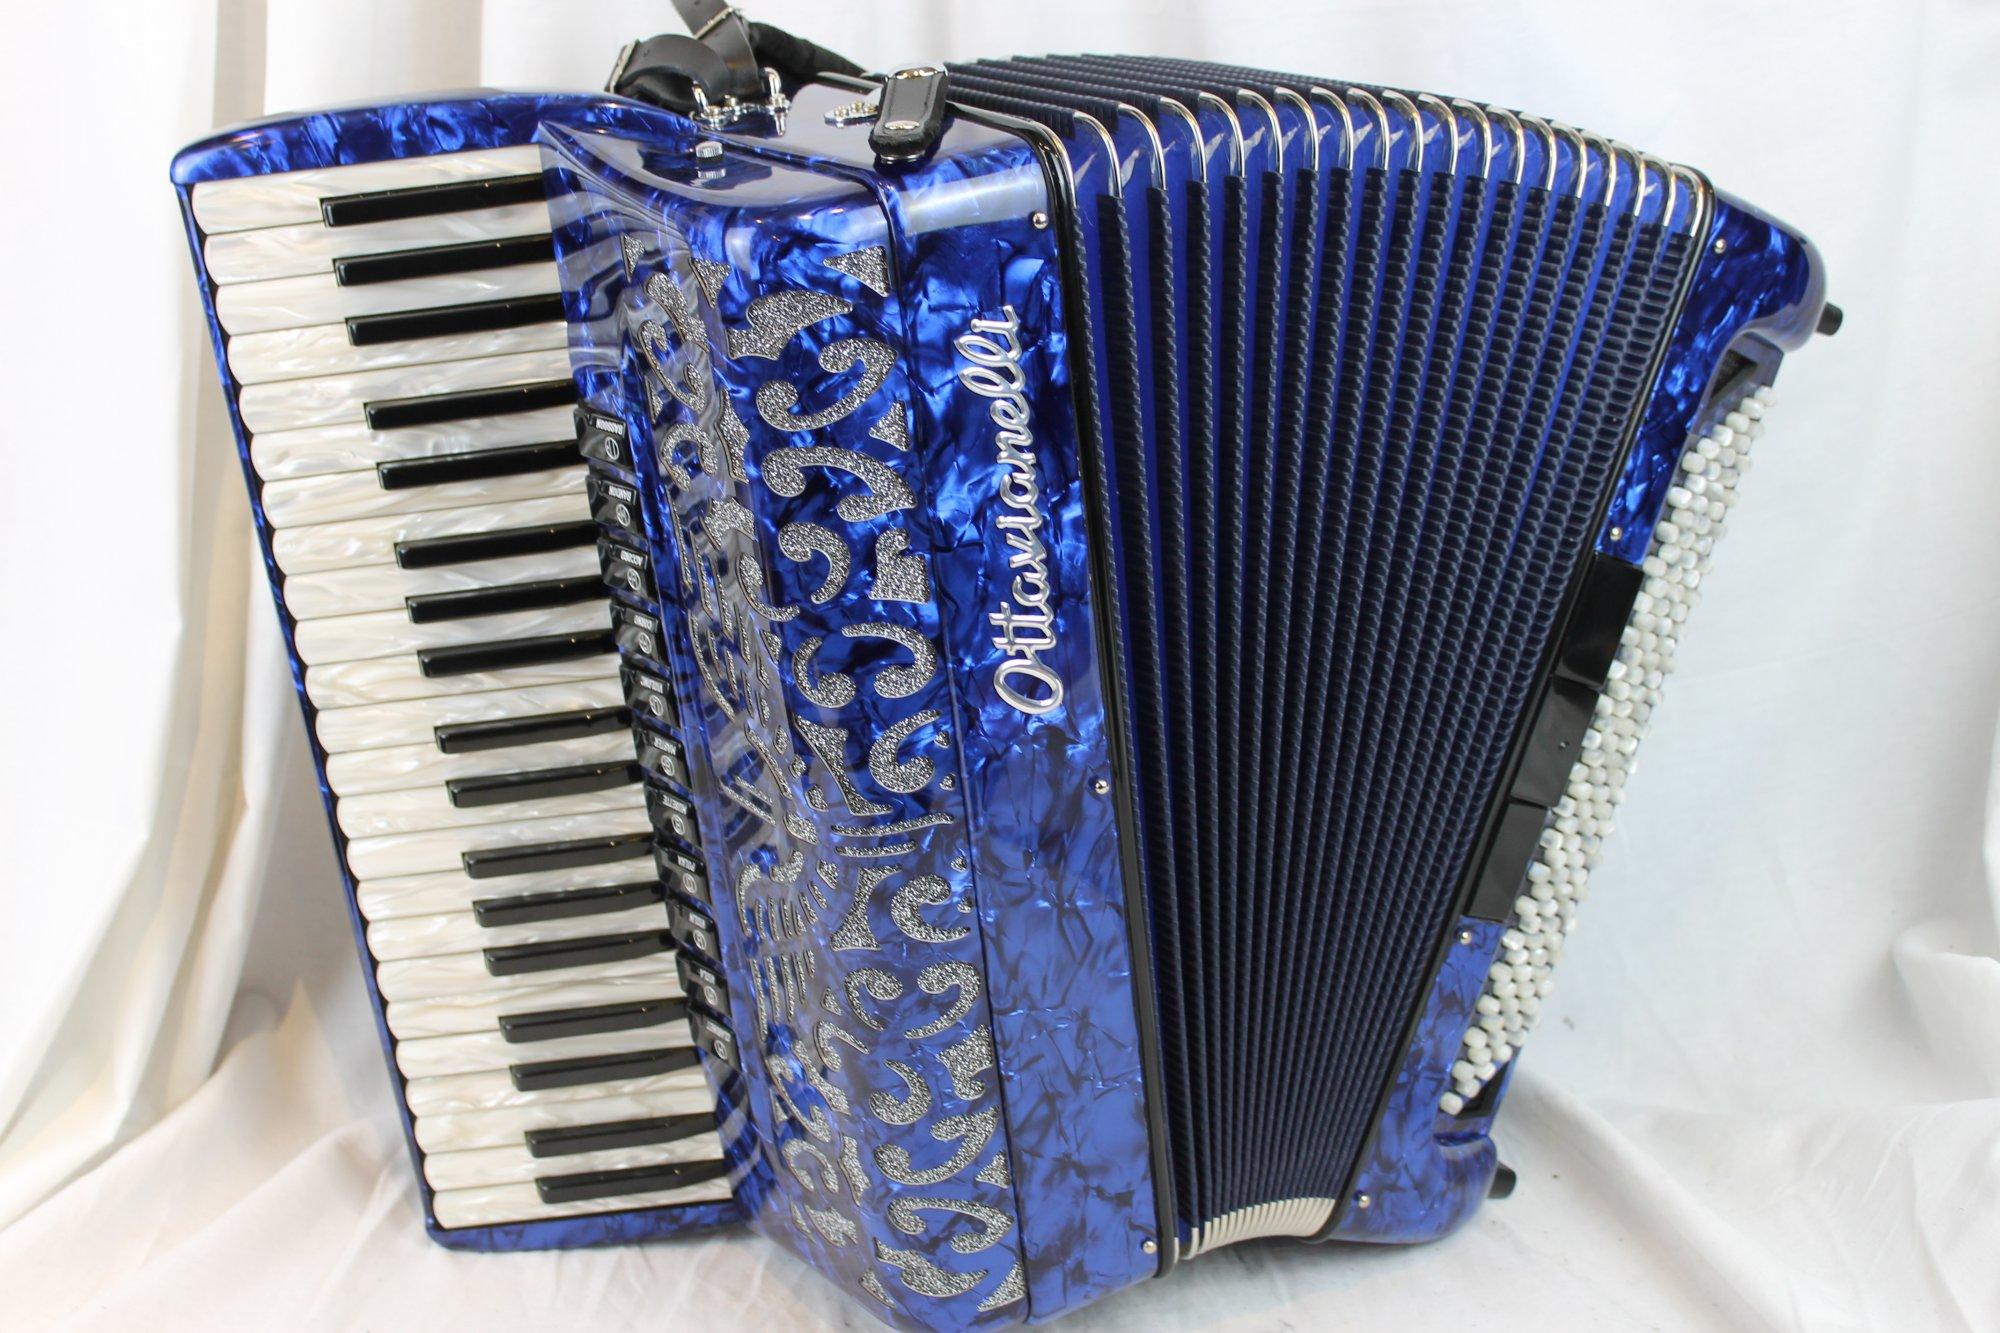 NEW Blue Ottavianelli Principessa II Piano Accordion LMMM 41 120